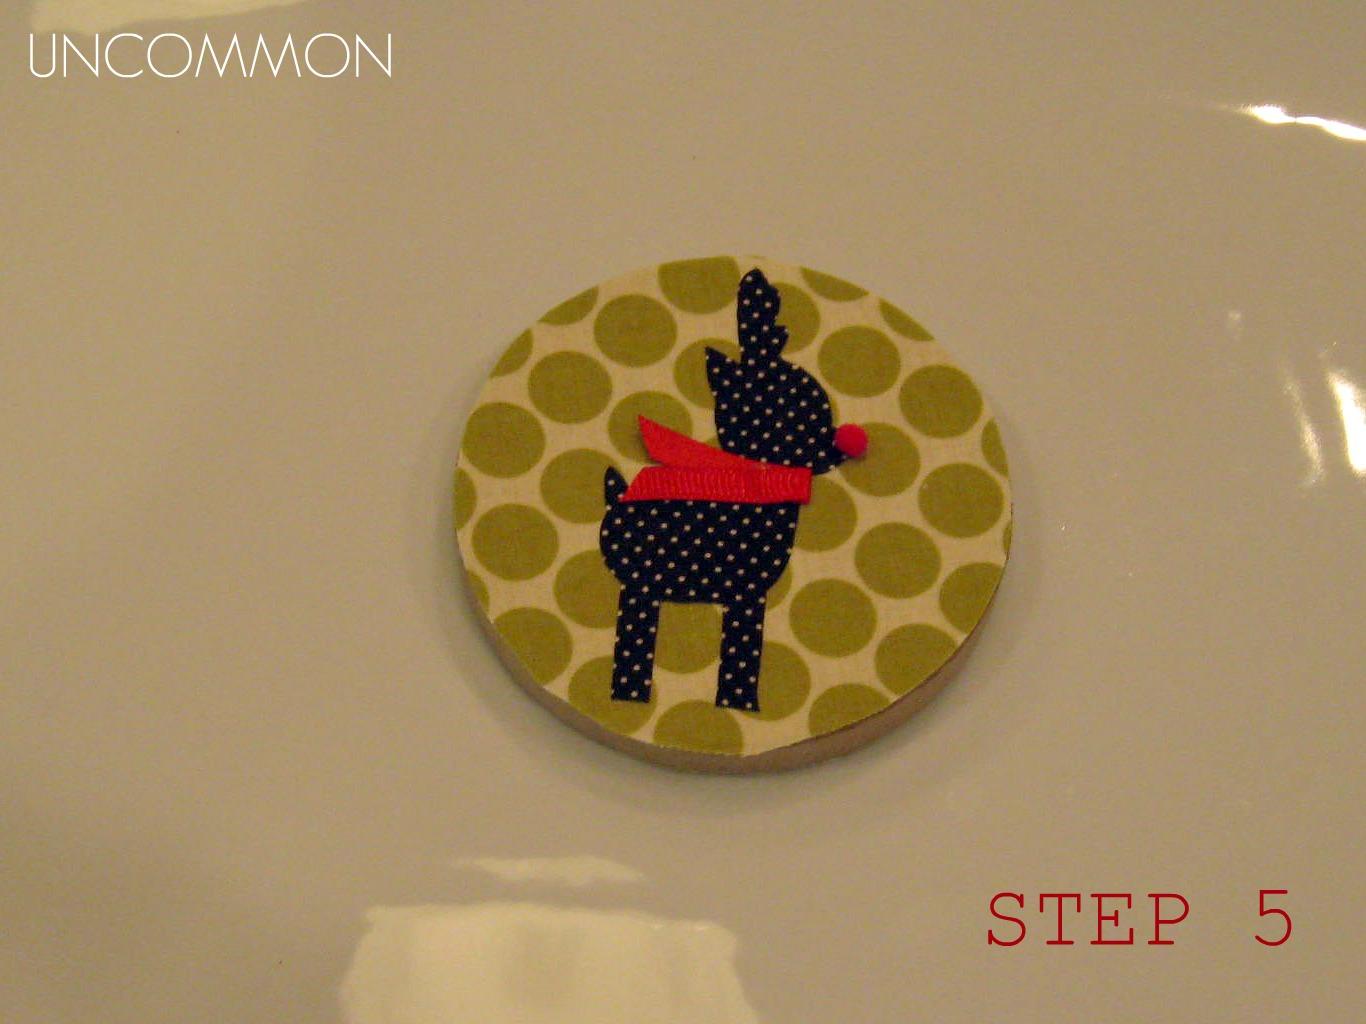 http://4.bp.blogspot.com/-UxuntNTJivE/TuKg2BzcI8I/AAAAAAAACAU/IjGpcjafsqc/s1600/Reindeer+Ornaments+Tutorial+Steps+Uncommon+Step+5.jpg